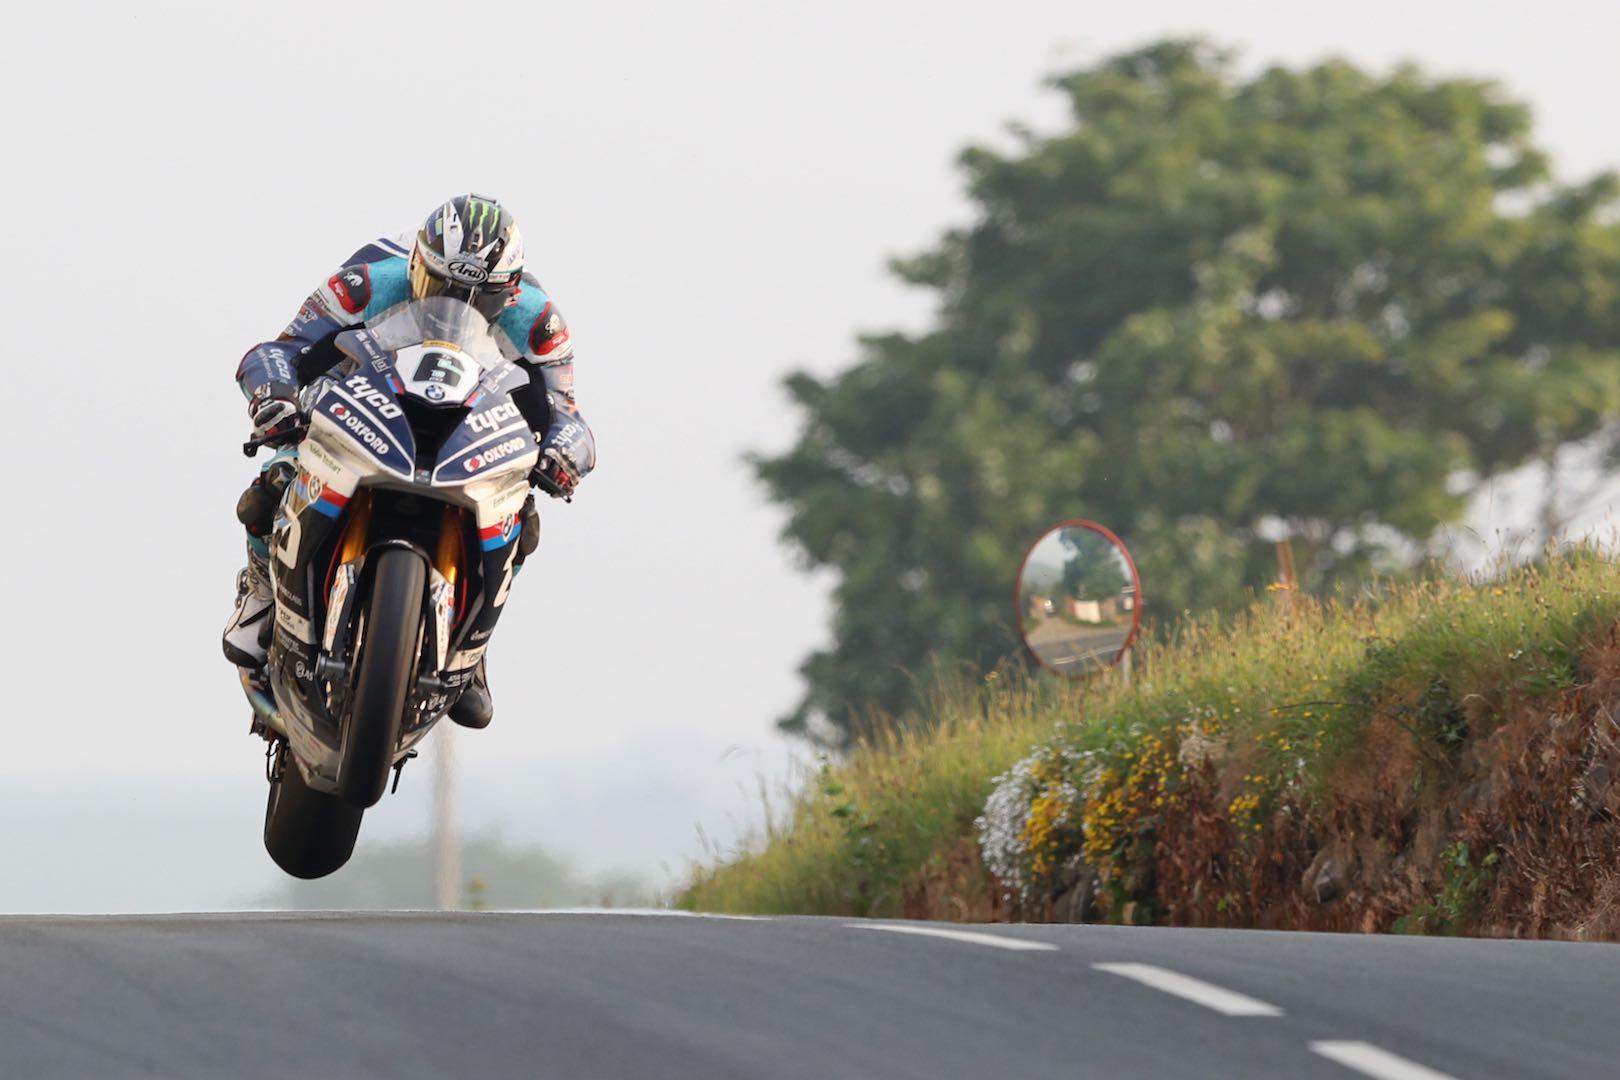 Cuộc đua Isle of Man TT 2018 (Nguồn: Ultimate Motorcycling)